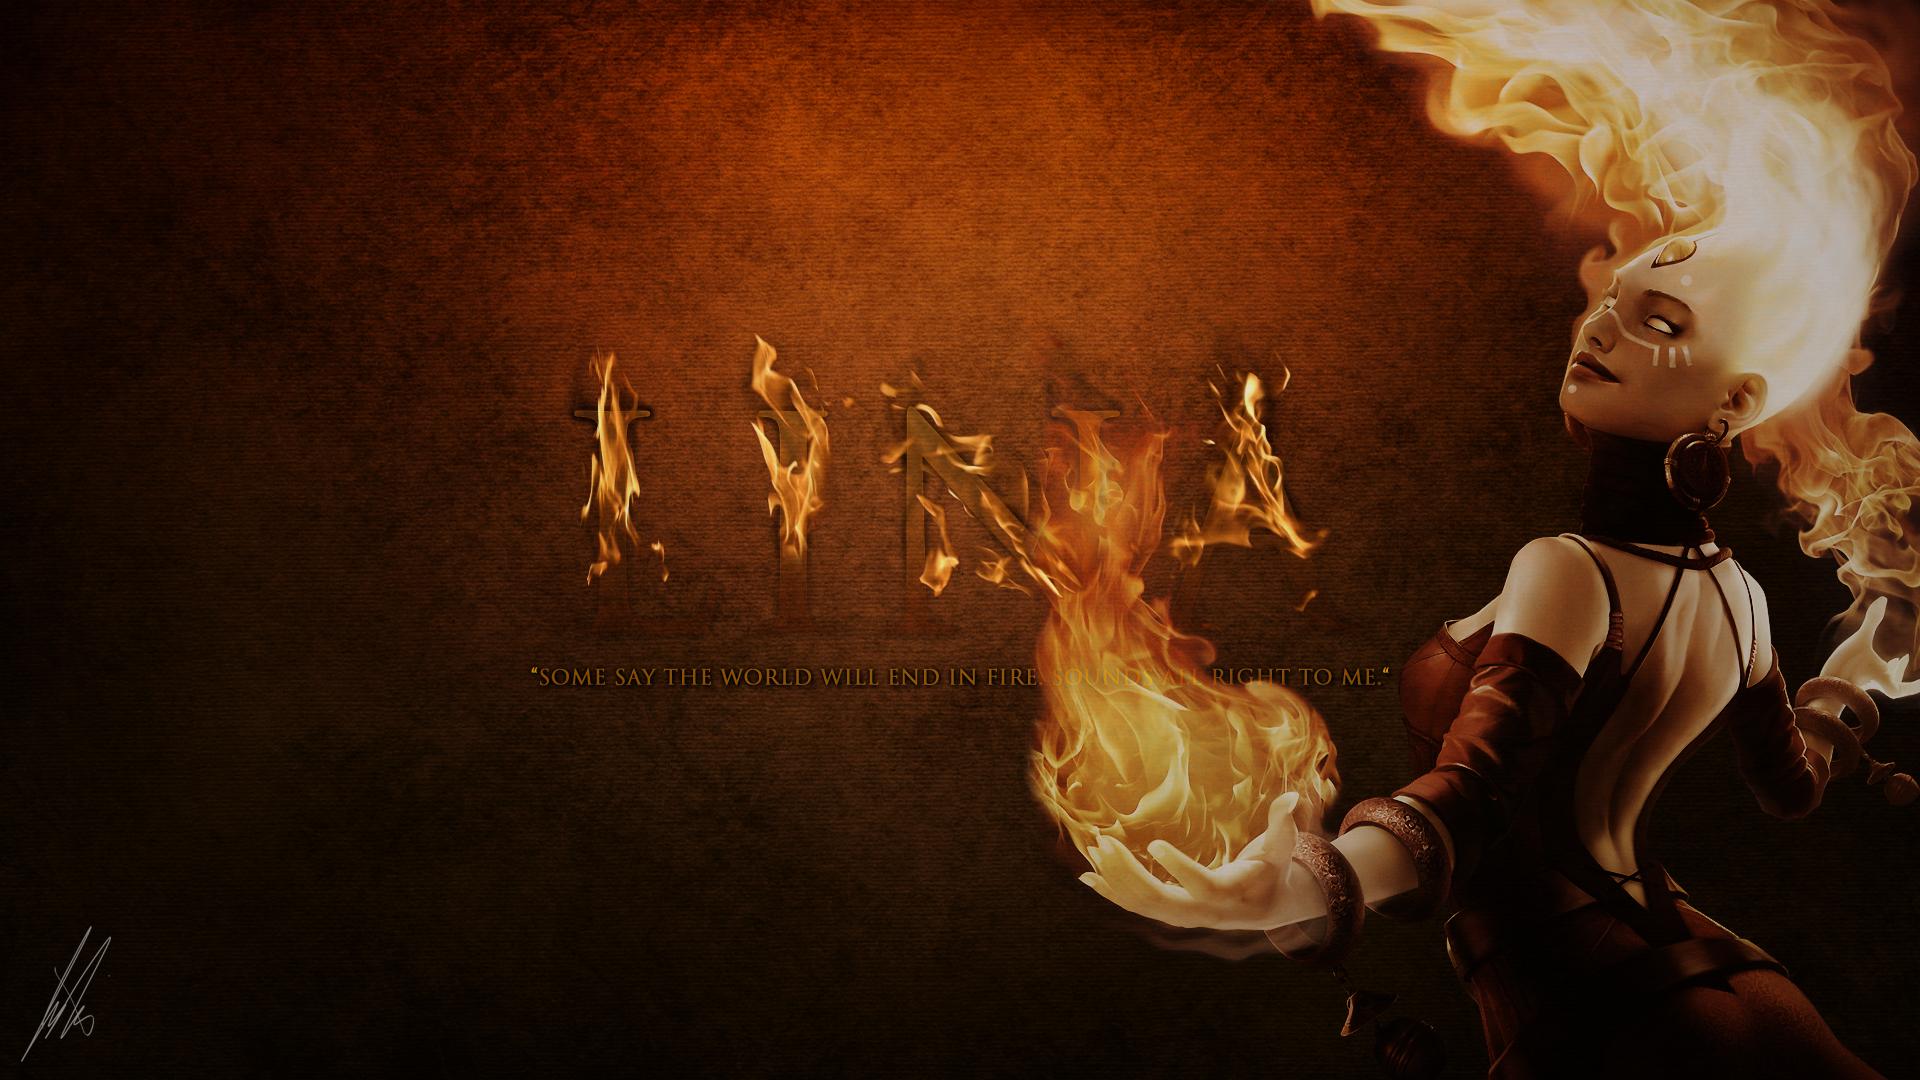 DotA 2 Lina Inverse Slayer By SexyFiren